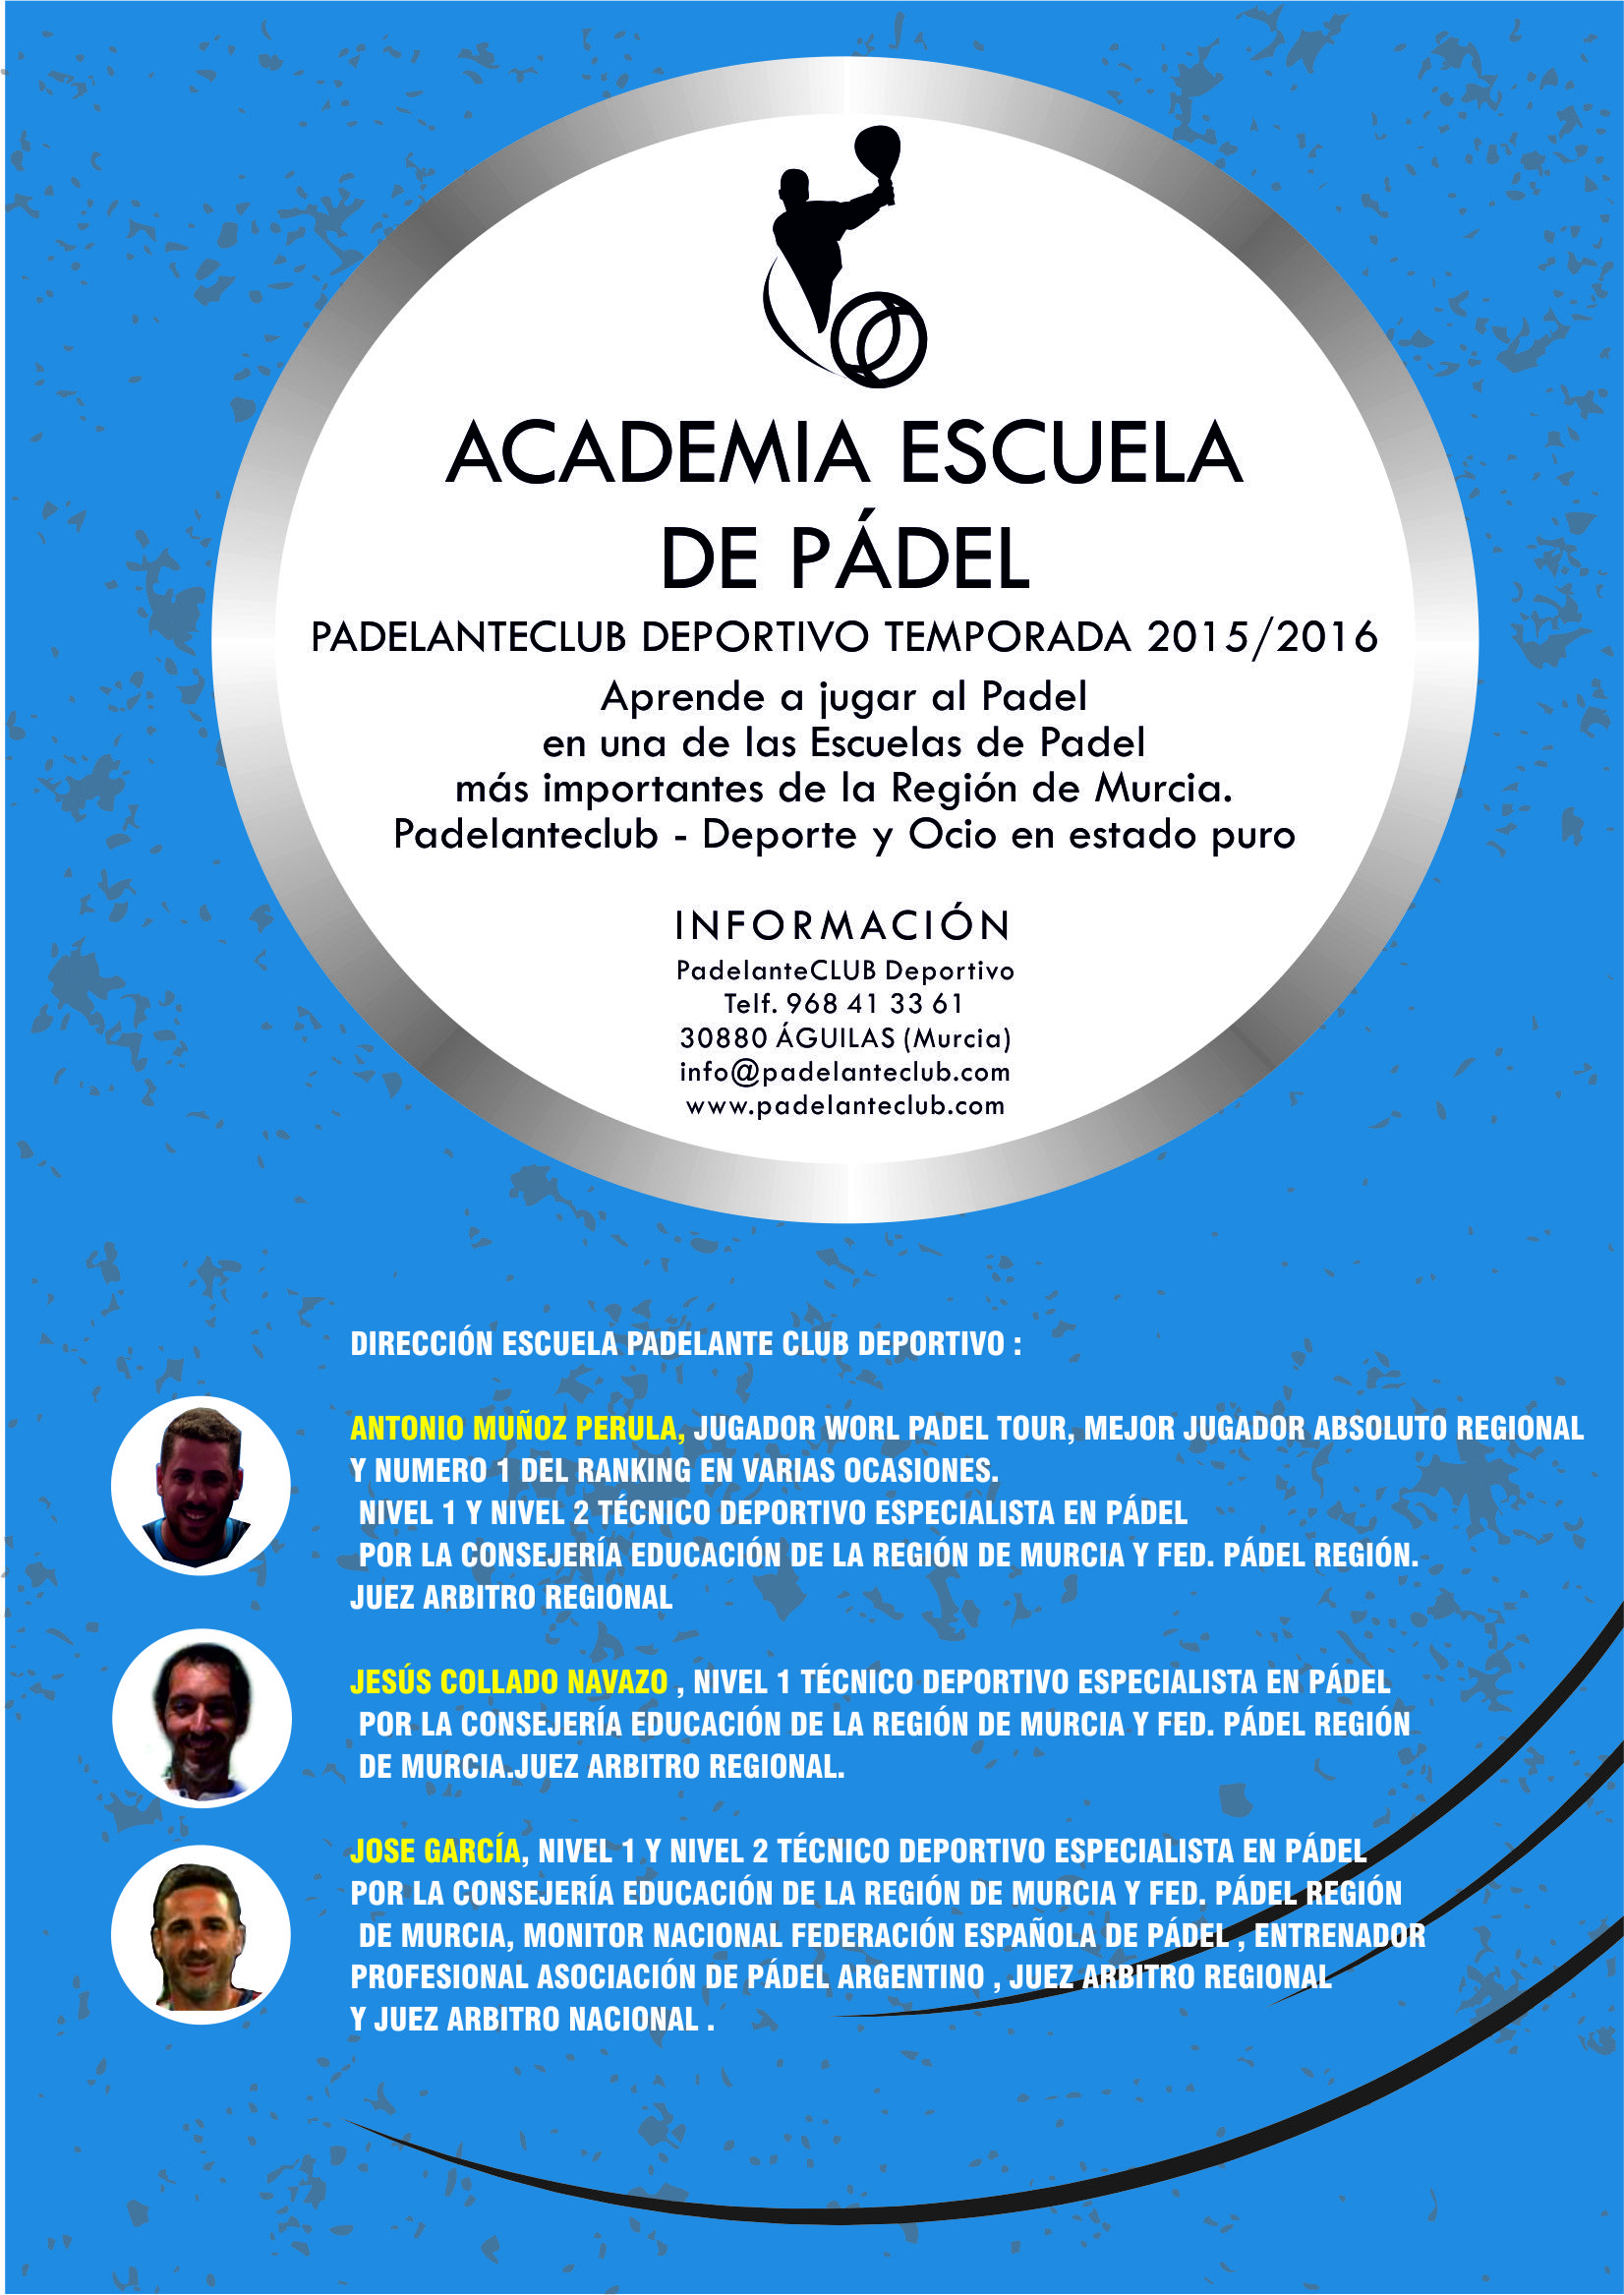 ACADEMIA ESCUALA DE PADEL  2015 - 2016 terminado2